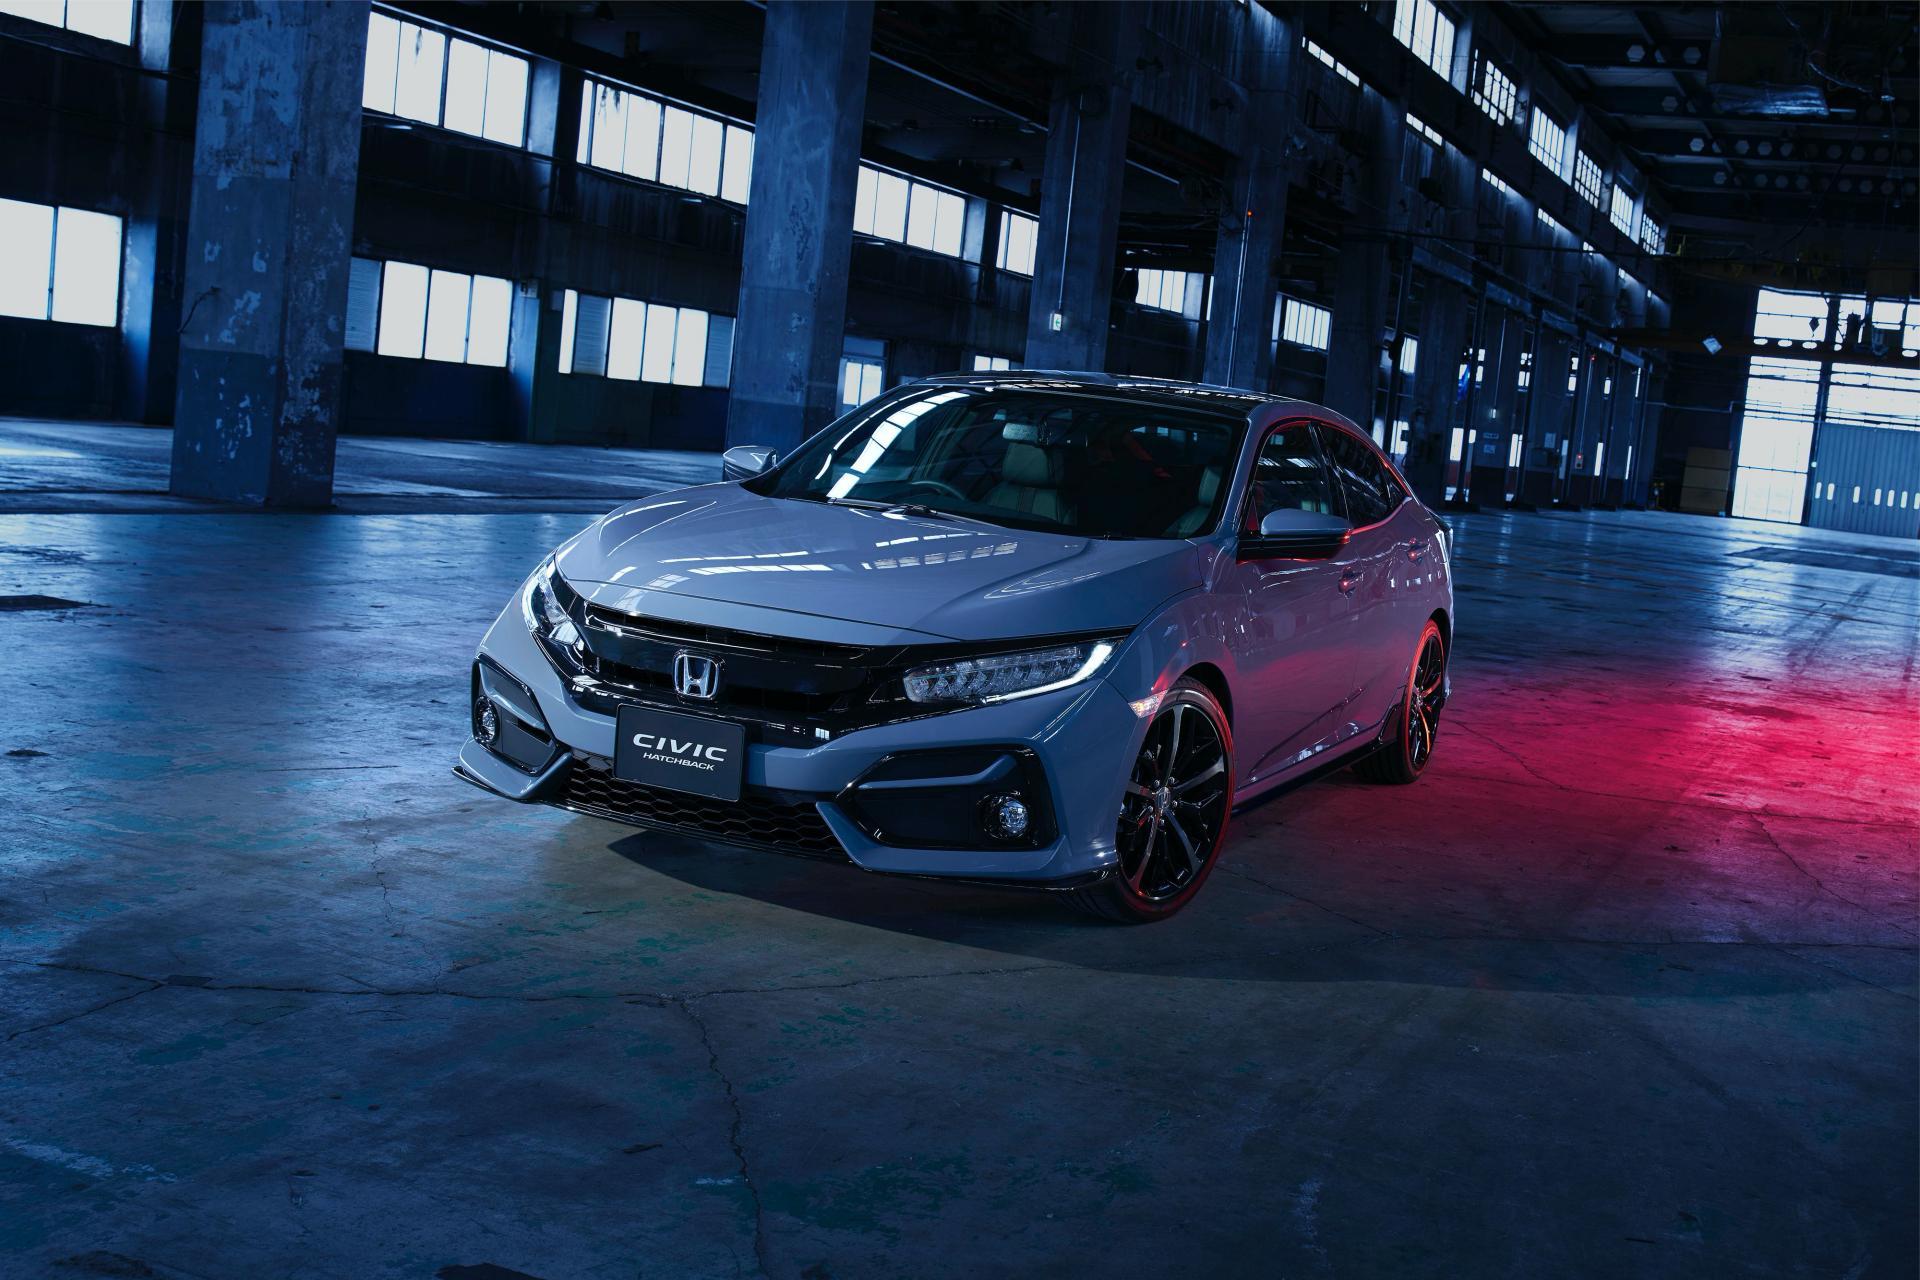 2020-Honda-Civic-Hatchback-JDM-spec